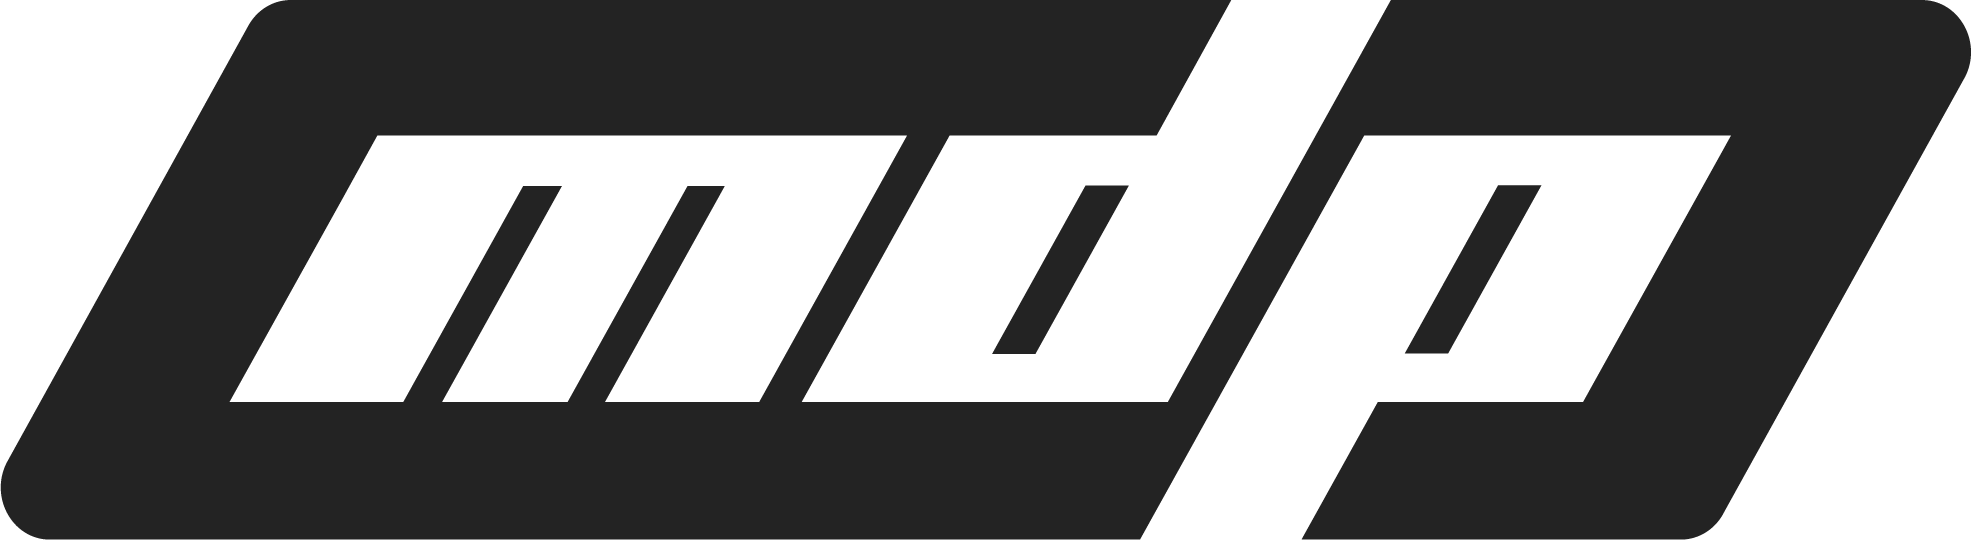 mdp logo siyah